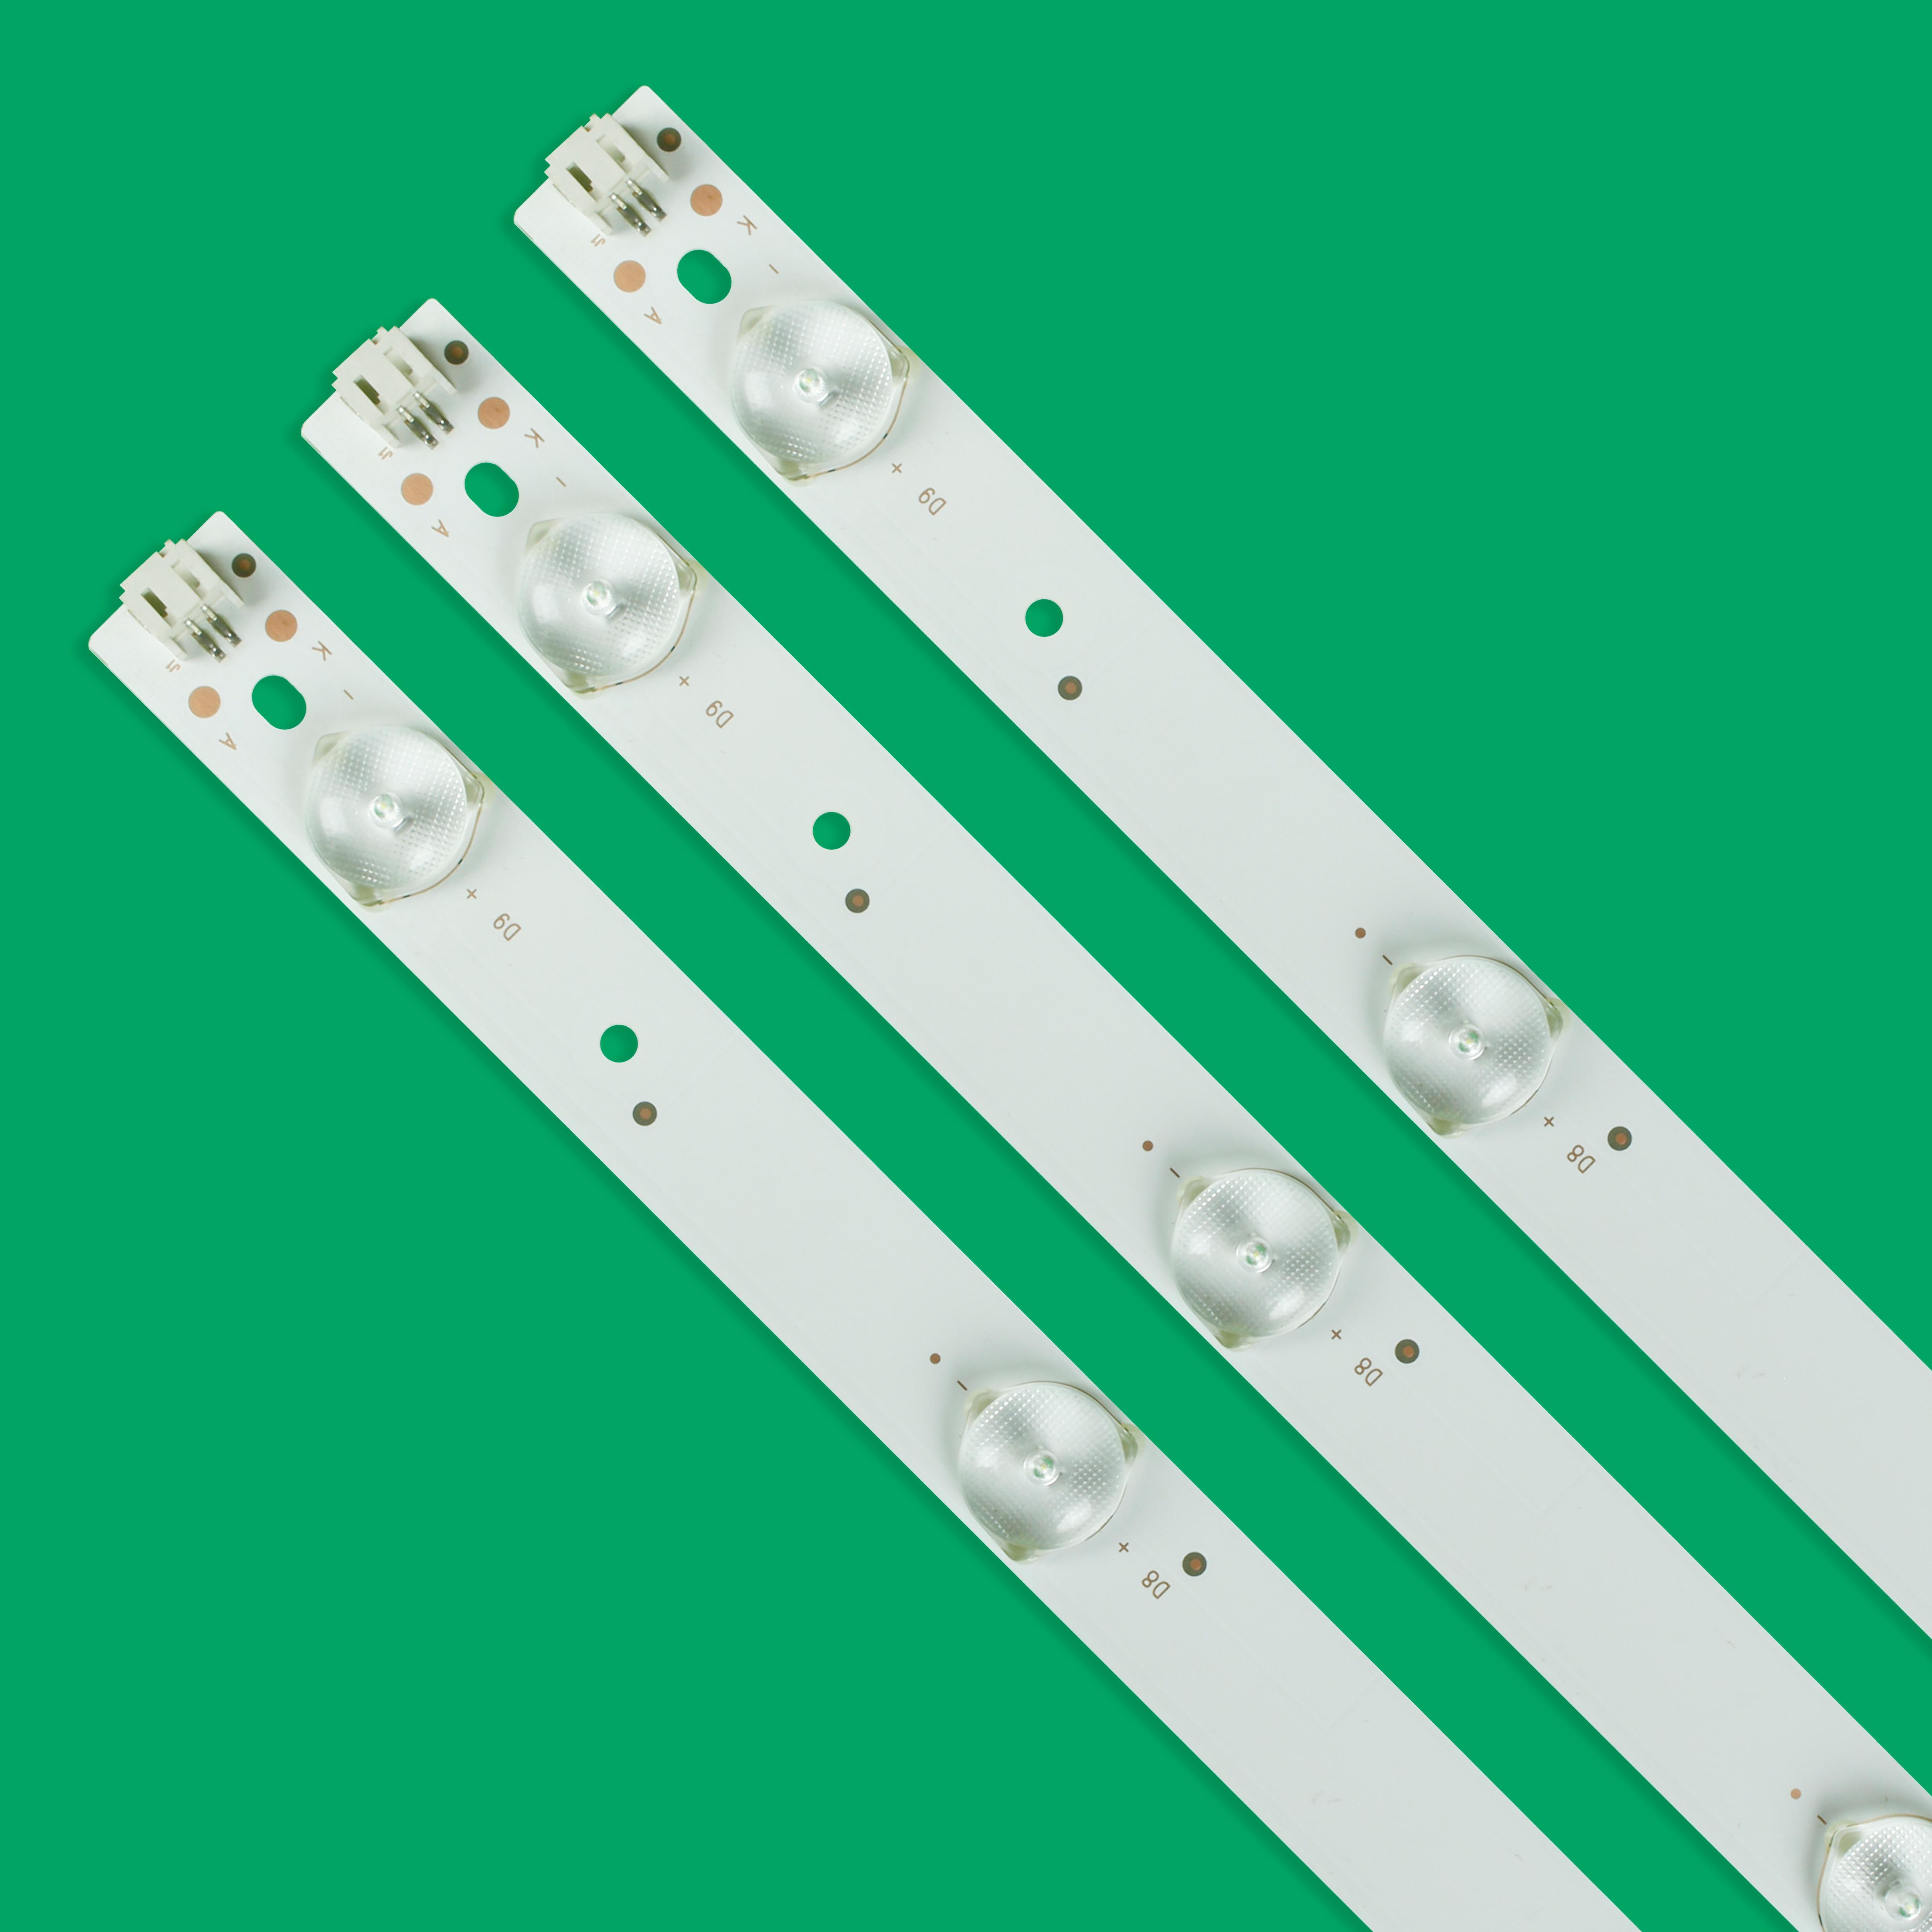 150pcs LED Backlight Strips for Phi lips Ph39n86dsgw Ph39n86 Kit barra de led da tv  PH39N86DSGW OY385D09-ZC21FG-01 303WY3850 enlarge